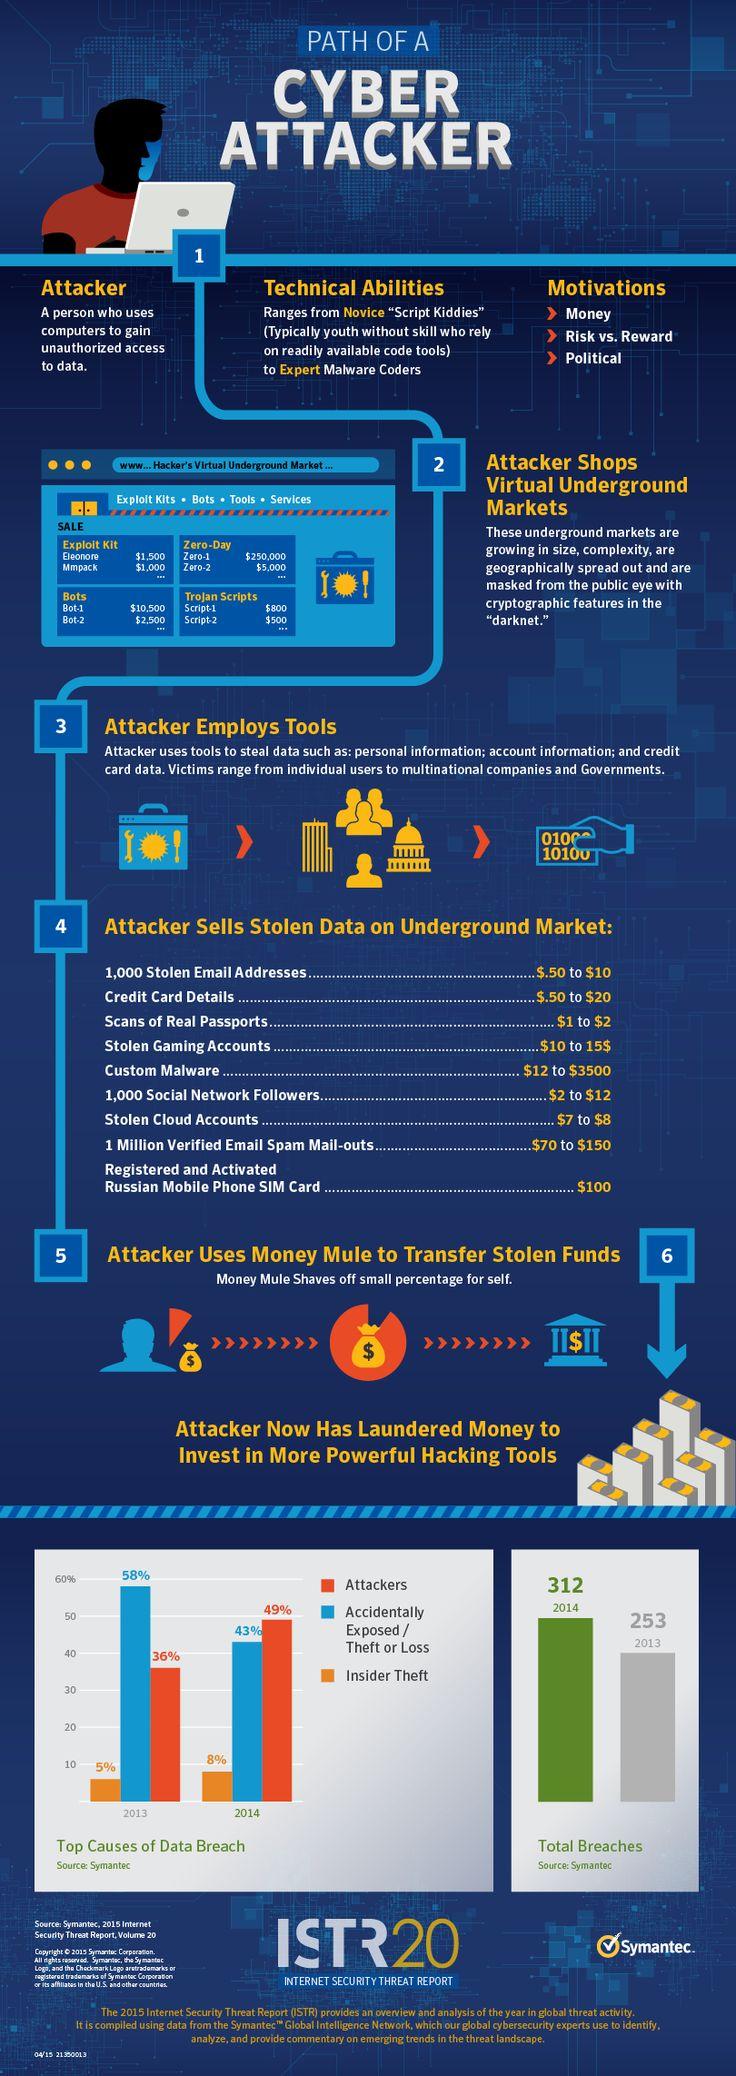 Internet Security Threat Report 2015 | Symantec